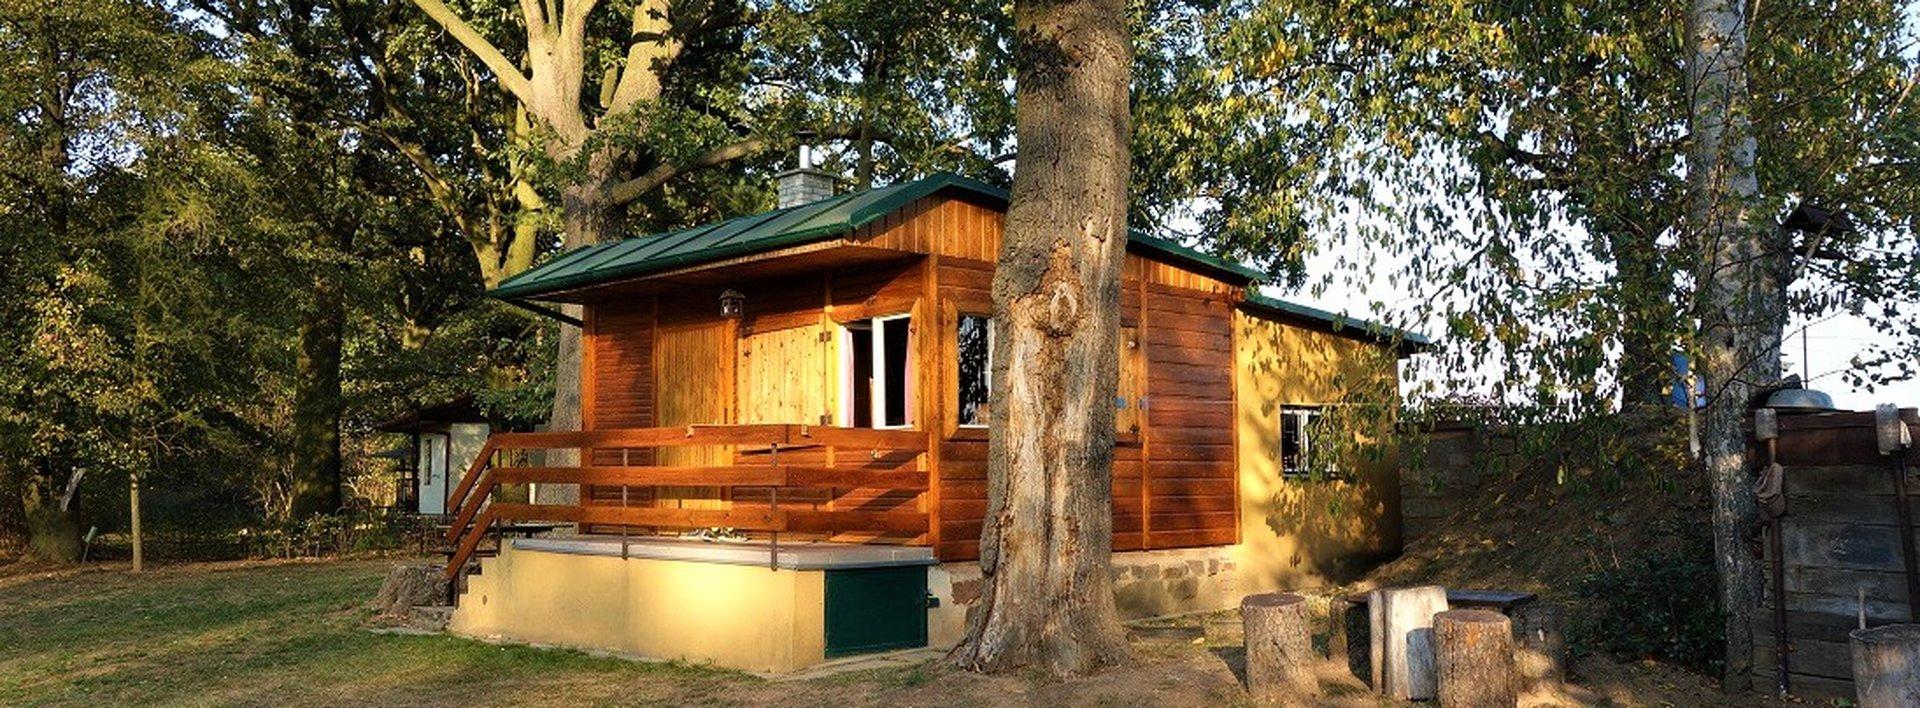 Chata na břehu Labe, 42 m² - Bukovina nad Labem, Ev.č.: N48620